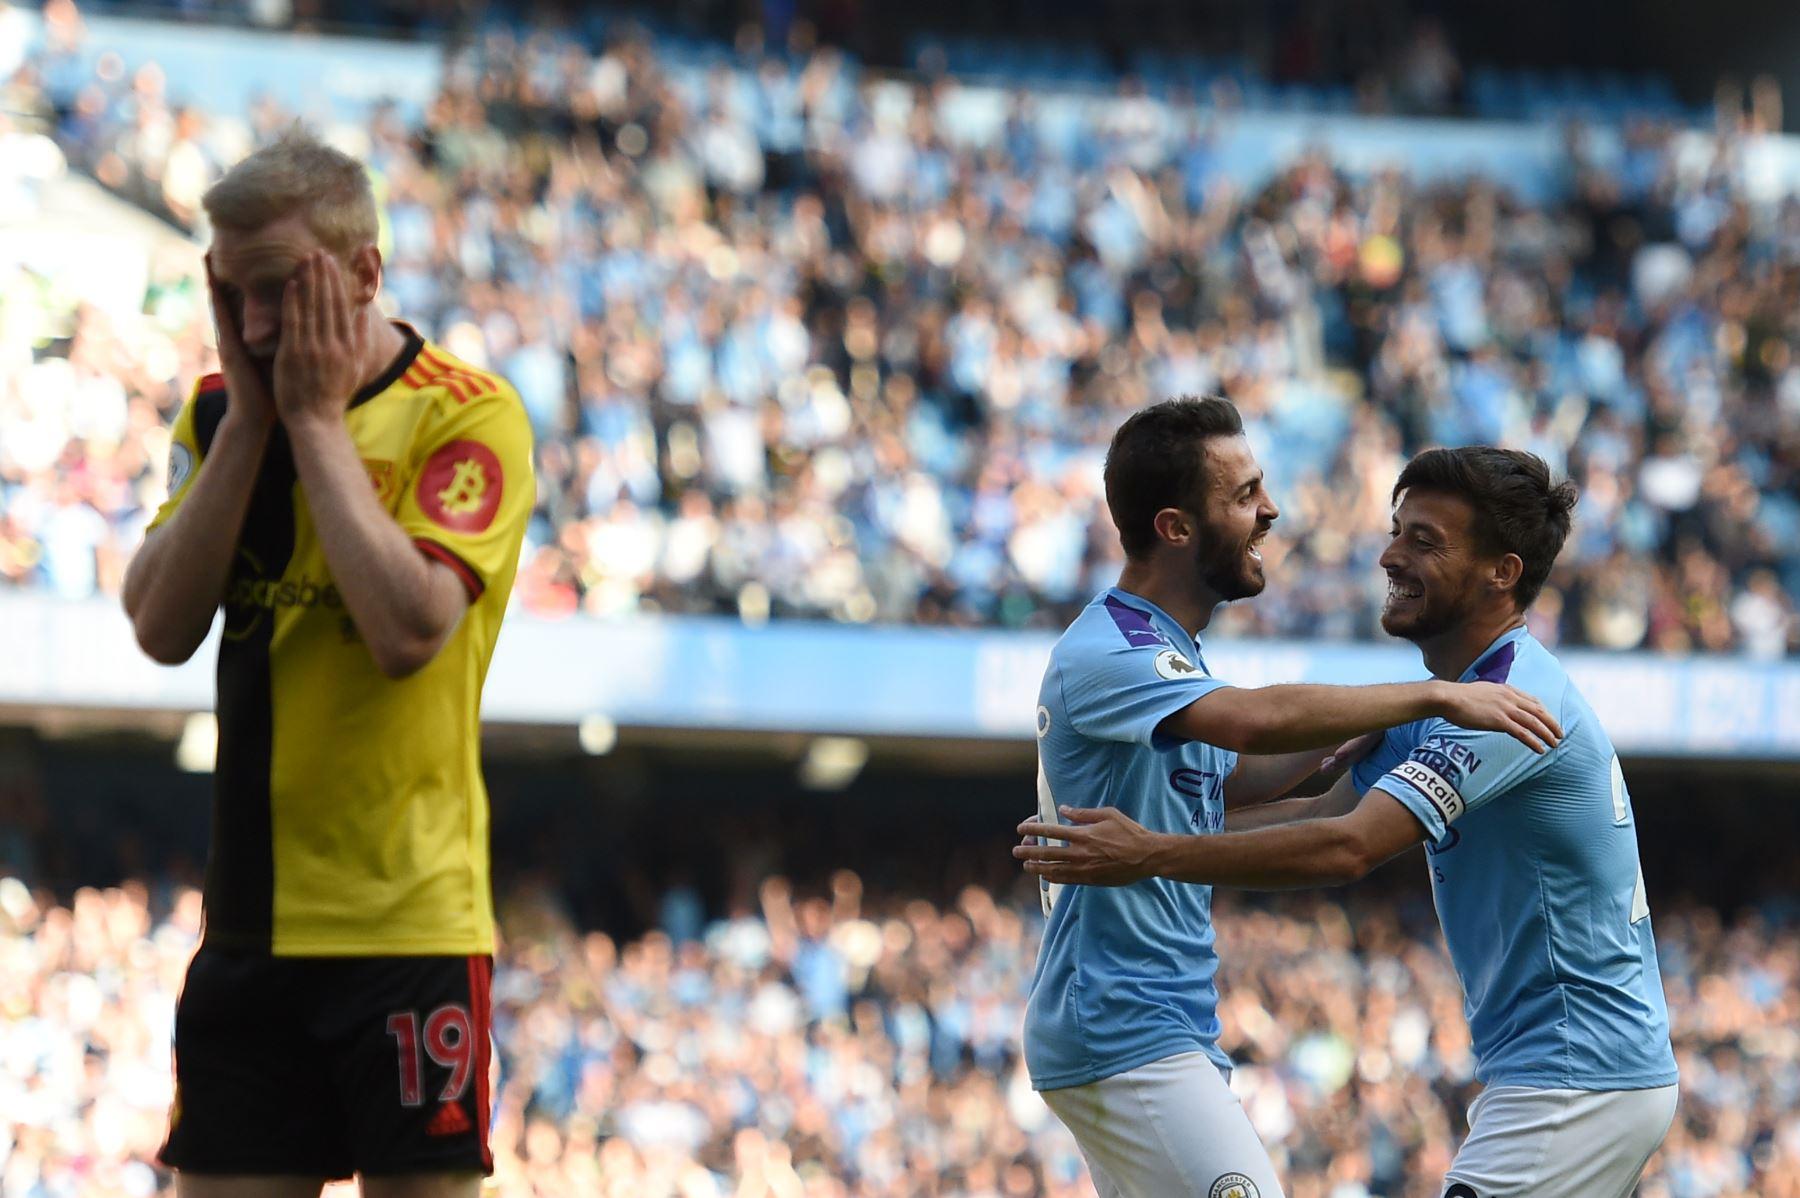 El centrocampista inglés de Watford Will Hughes reacciona cuando el centrocampista portugués del Manchester City Bernardo Silva (CL) celebra con el centrocampista español del Manchester City David Silva. Foto: AFP